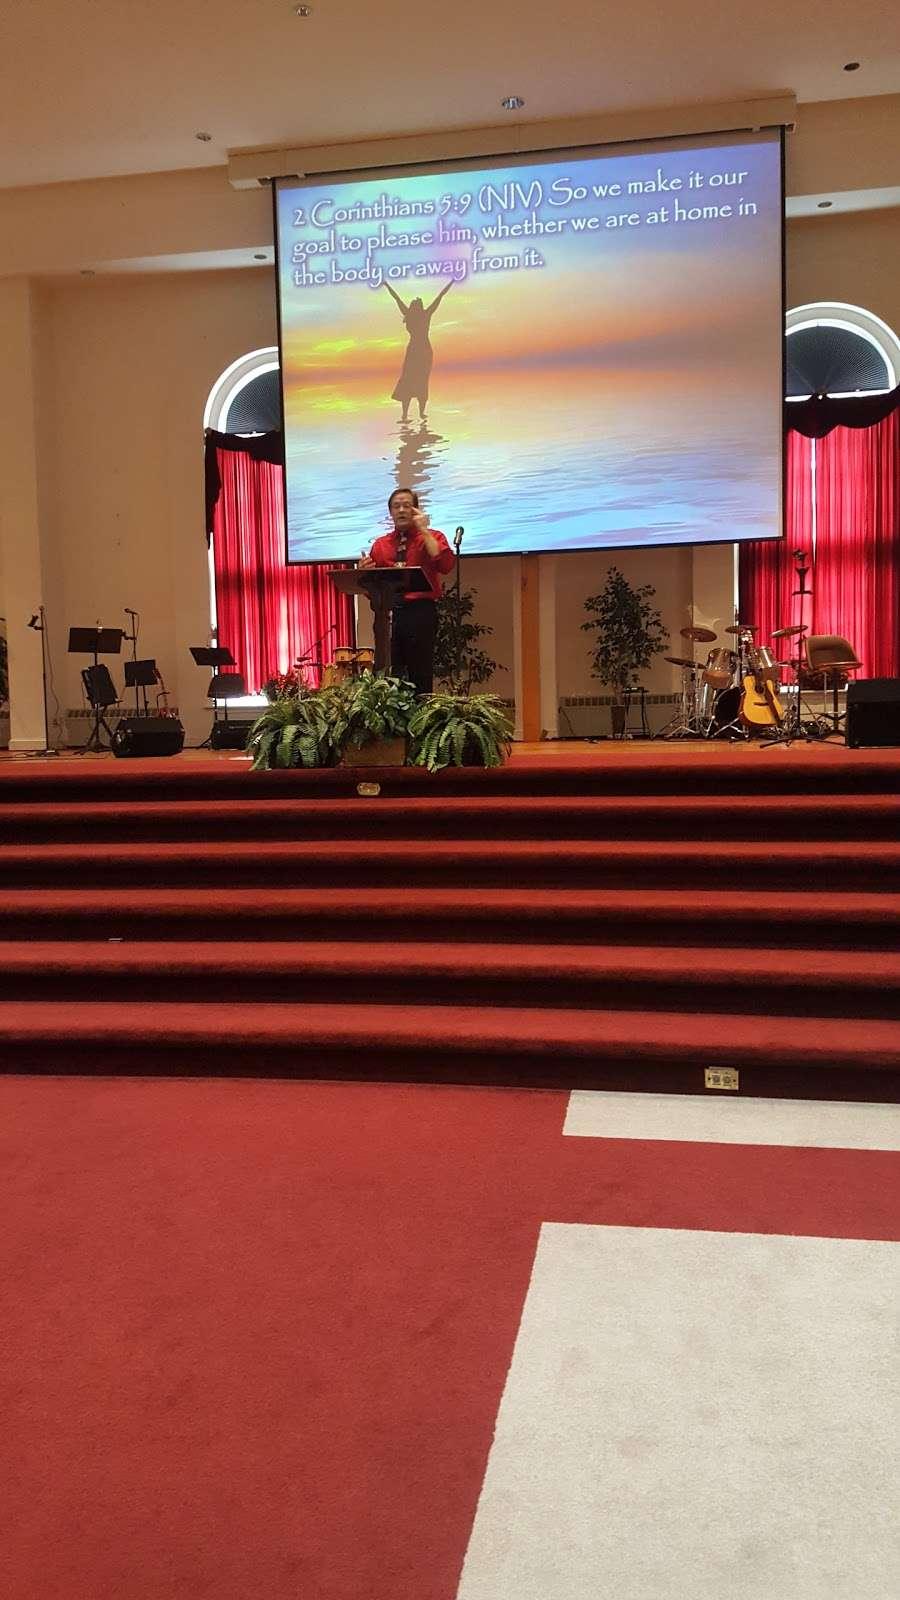 Crossroads Worship Center Church - church  | Photo 5 of 10 | Address: 190 Lambs Rd, Sewell, NJ 08080, USA | Phone: (856) 589-8900